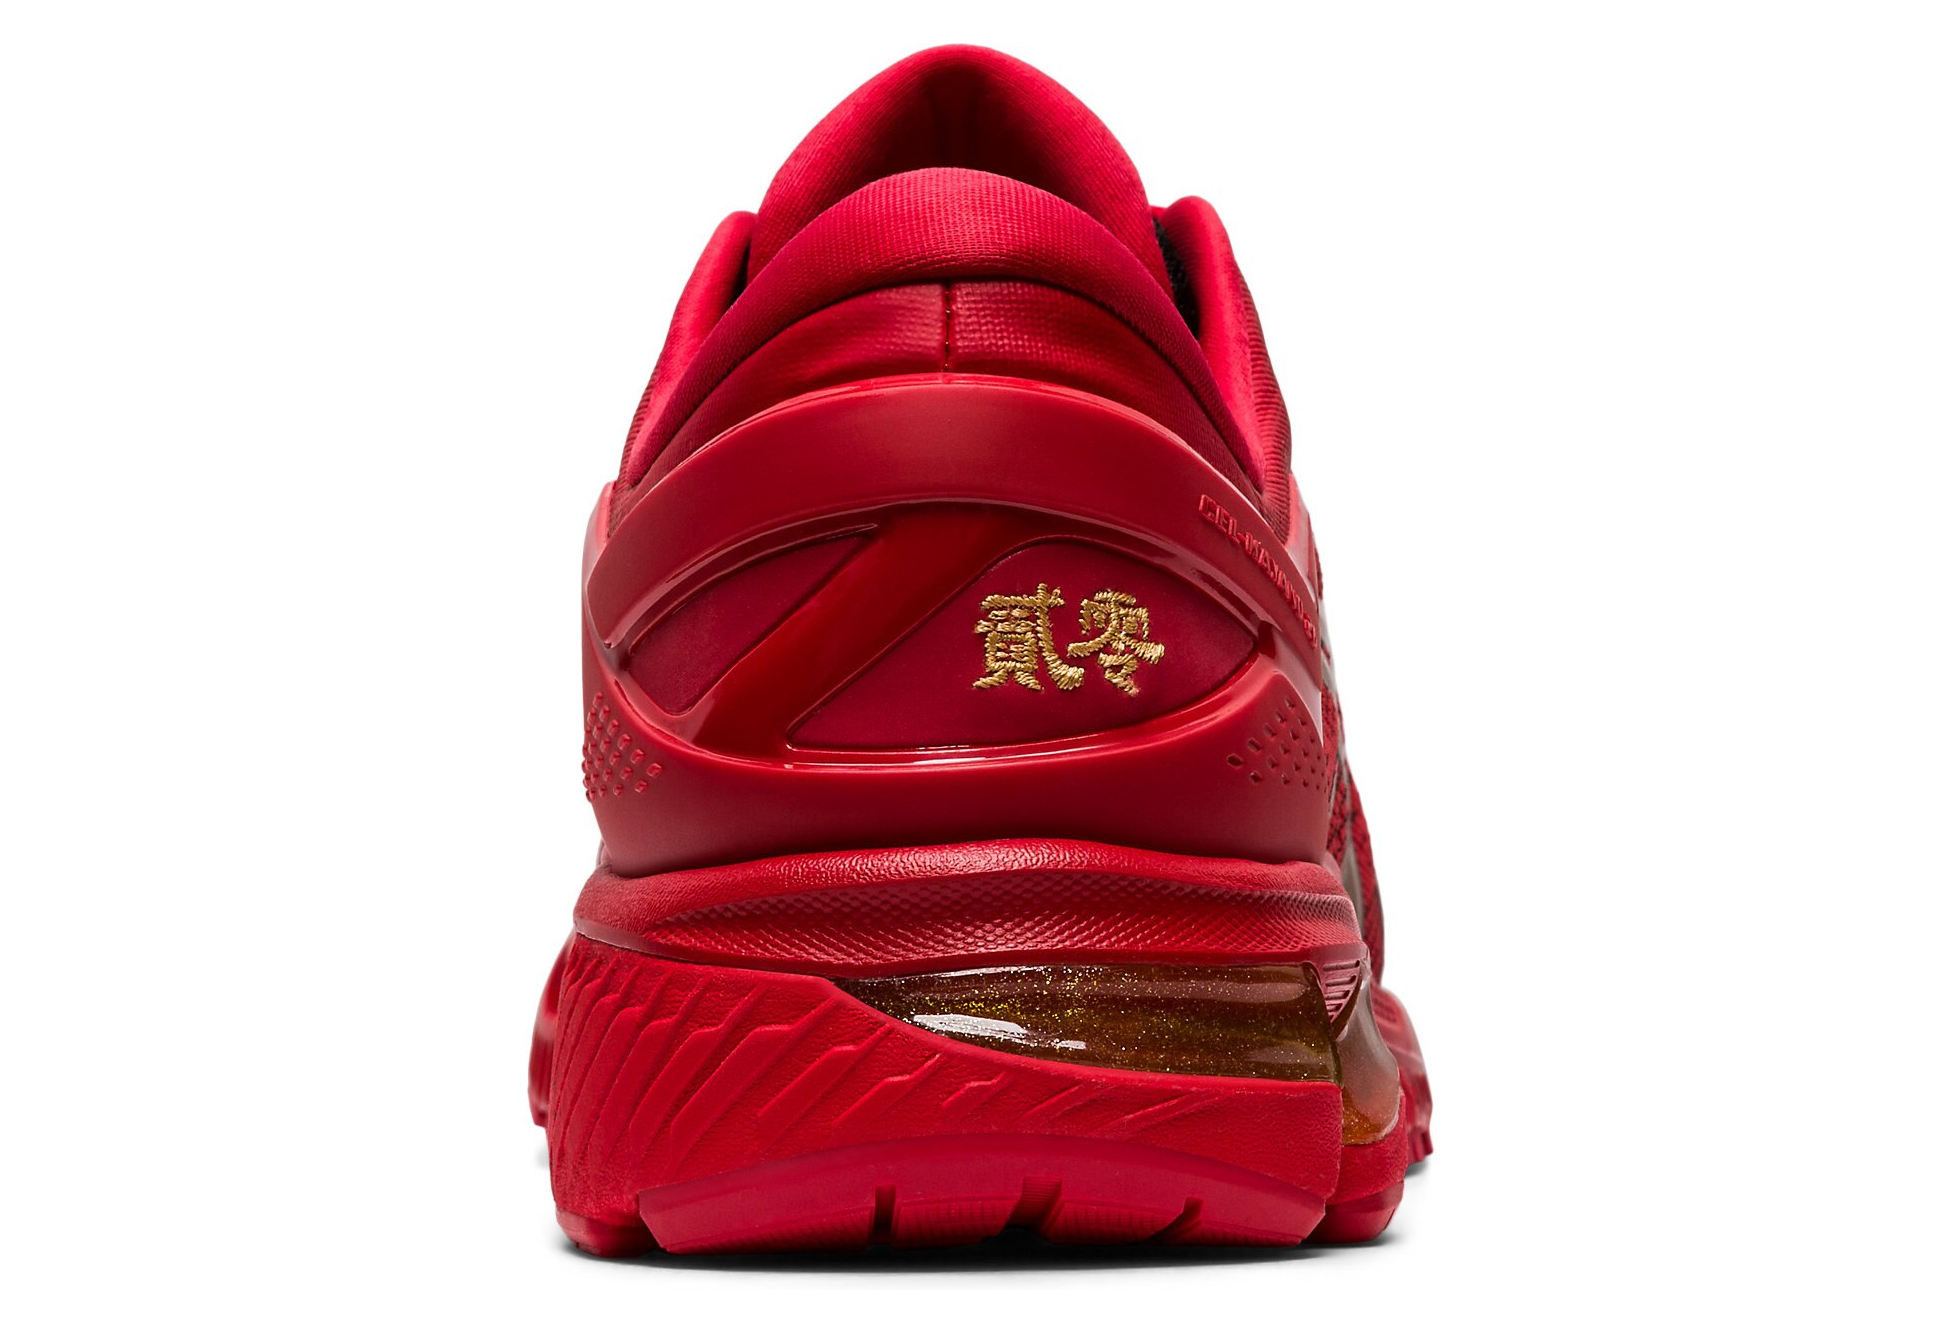 Asics Gel Kayano 26 Lucky Red